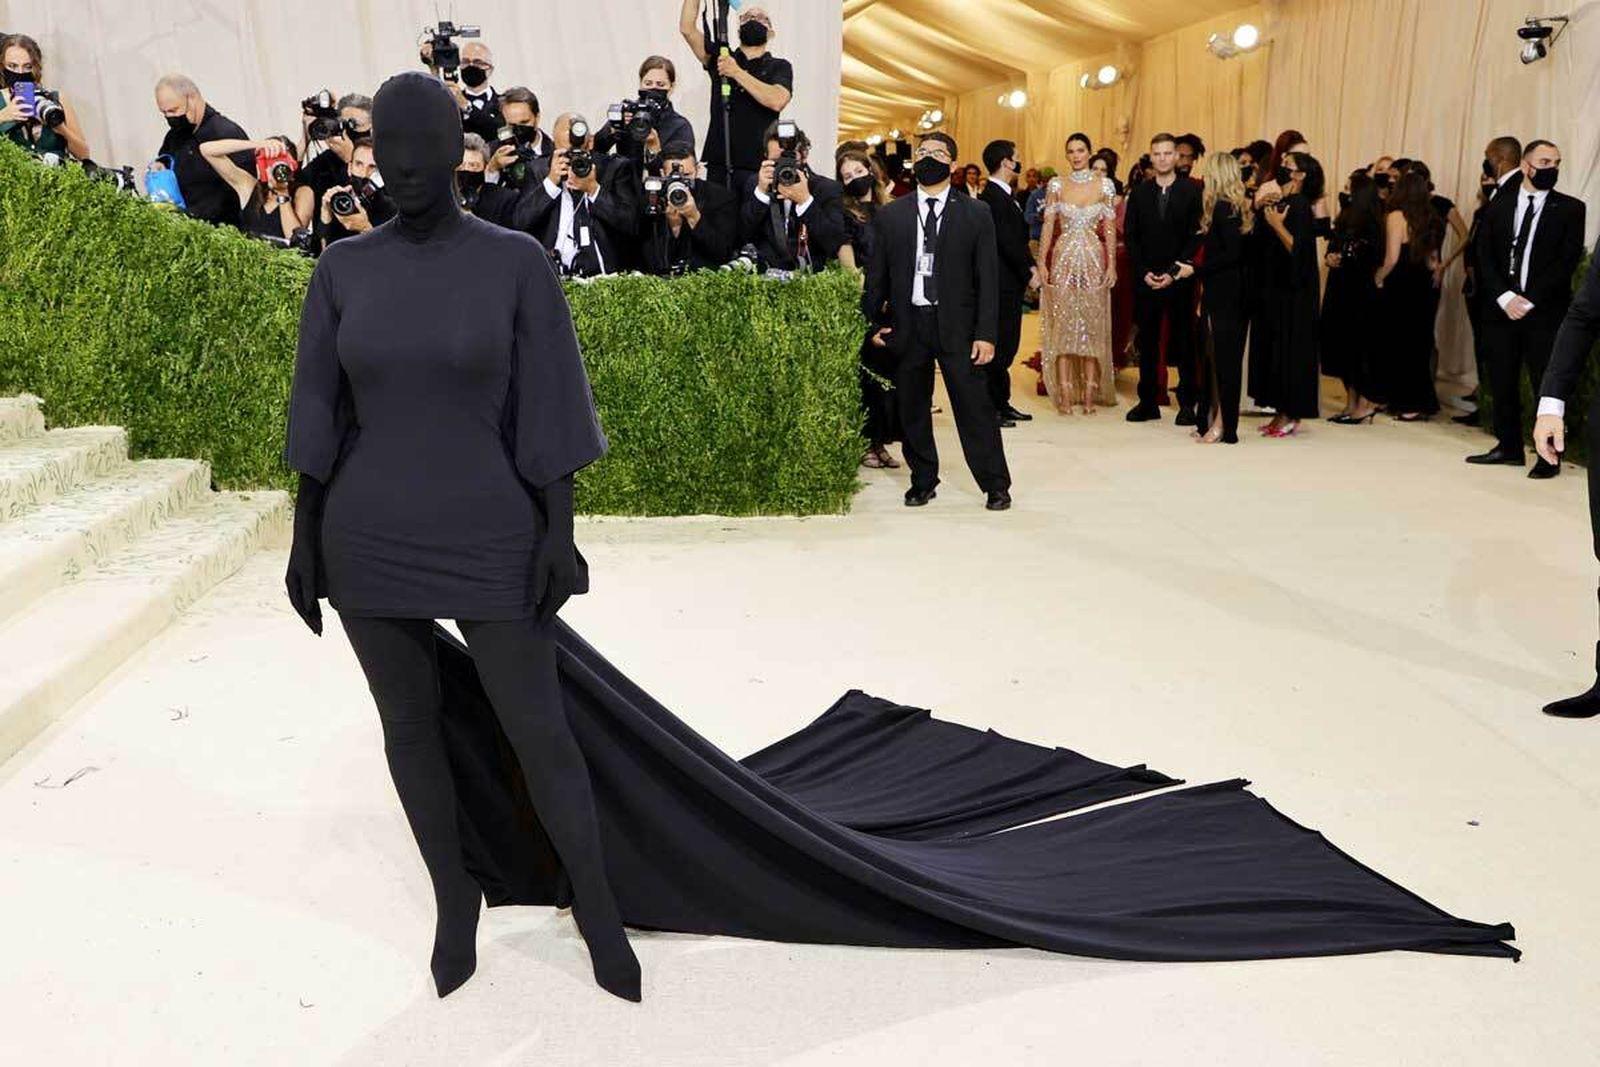 met gala 2021 celebrity style looks best outfits red carpet kim kardashian